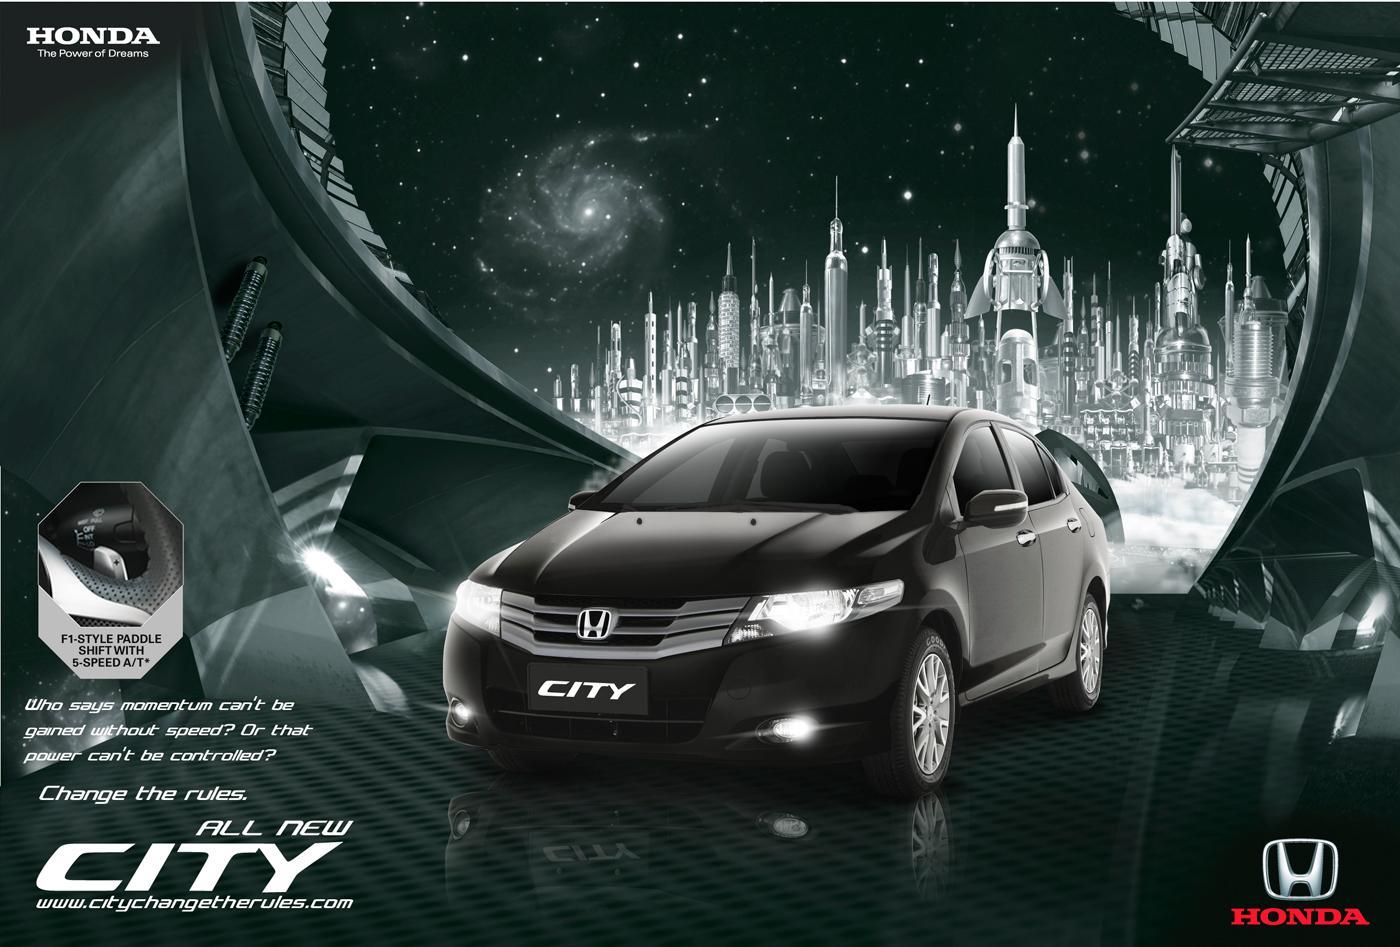 Honda Print Ad -  Change the rules, 5